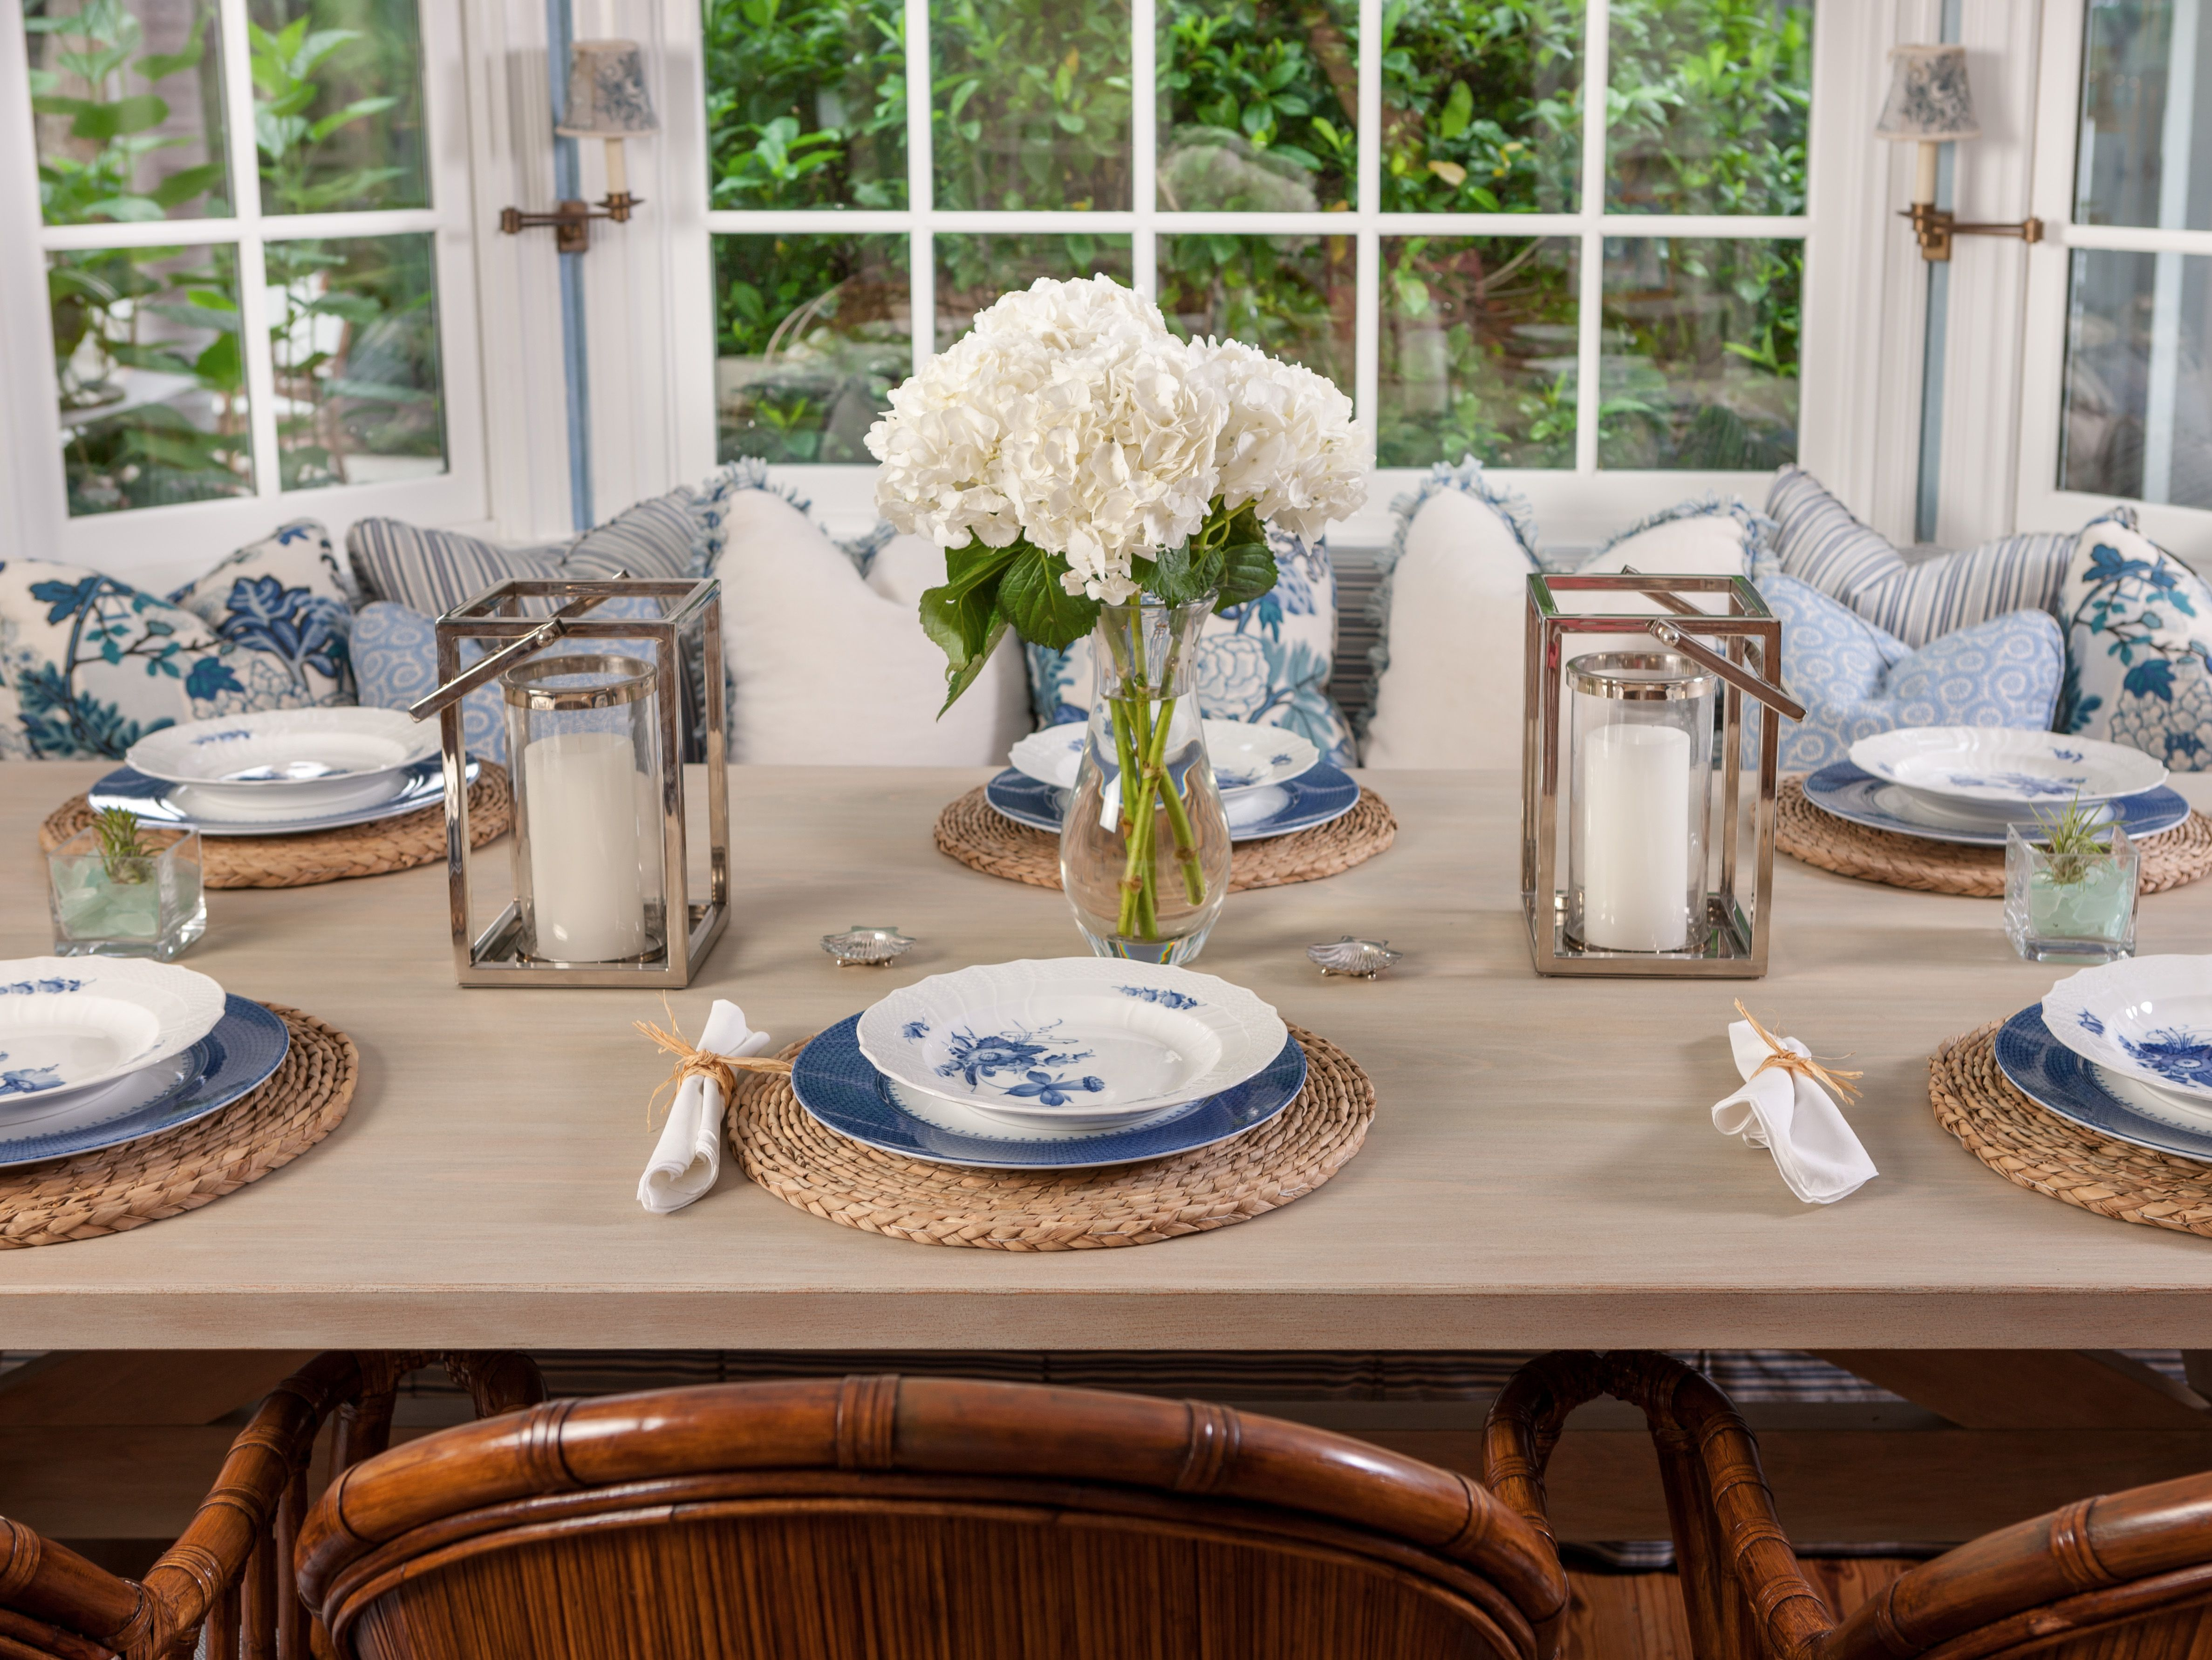 Palm Beach Dining Room Custom Beech Wood Table Simple Cut Floral Centerpiece